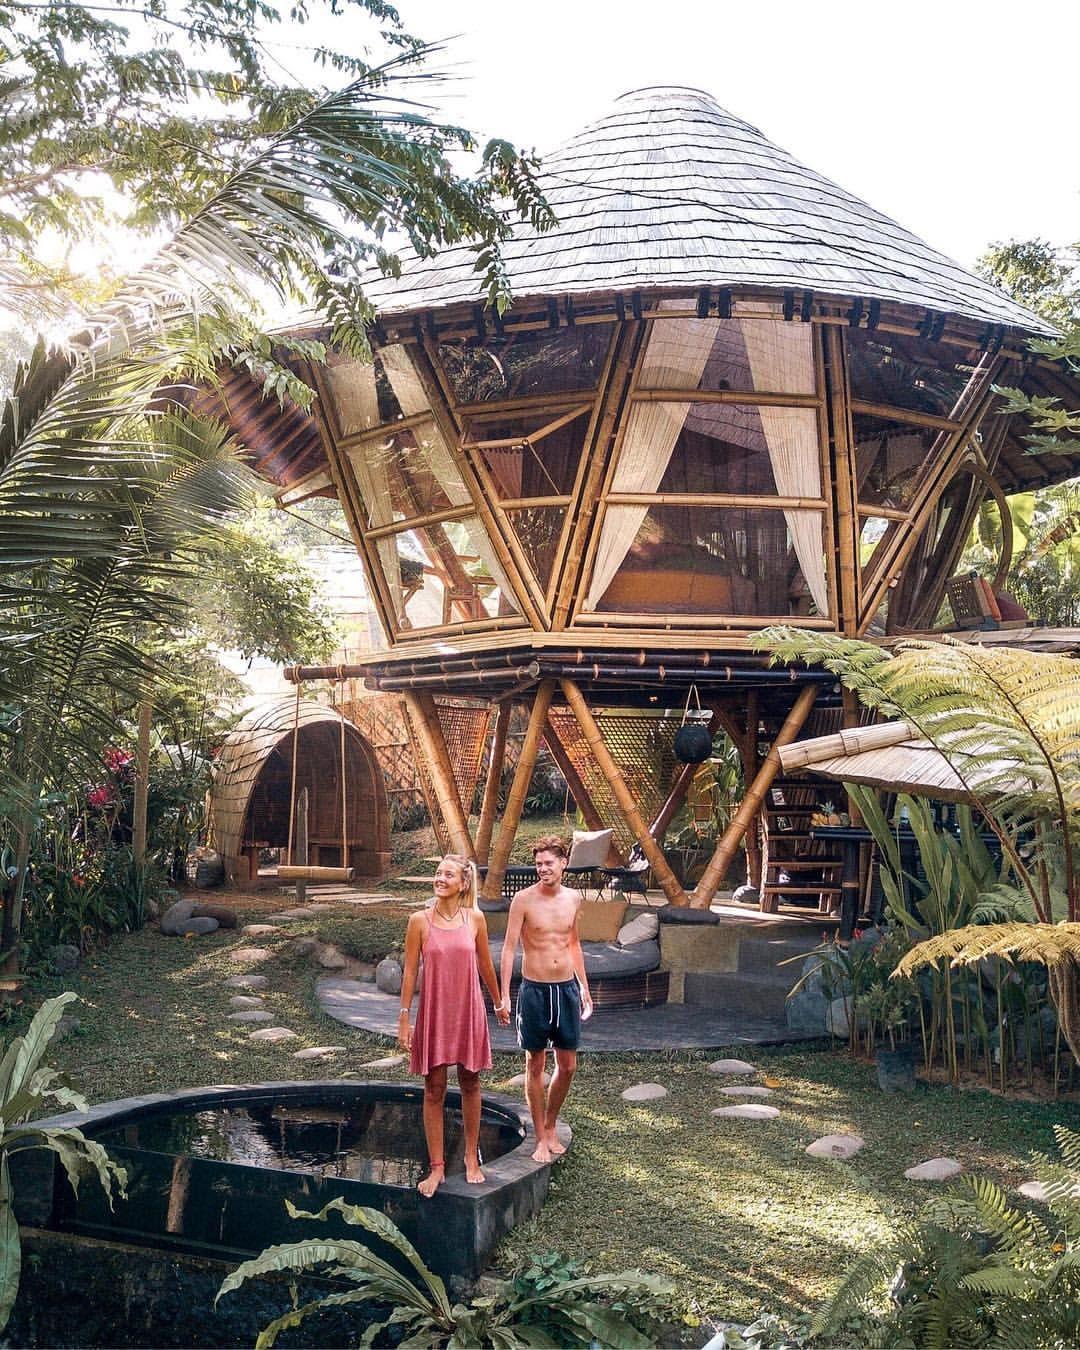 Hideout Bali - Hideout Beehive Bali - Bamboo Home - Quirky Accommodation - Cool Hotels Bali - Bali Swing - Instagram Spots Bali - East Bali Indonesia - Wanderers & Warriors - Charlie & Lauren UK Travel Couple - Rice Terraces - Rice Fields - Sunrise Sunset - Dress - Style - Cap - Boyfriend - Girlfriend - Palm Trees